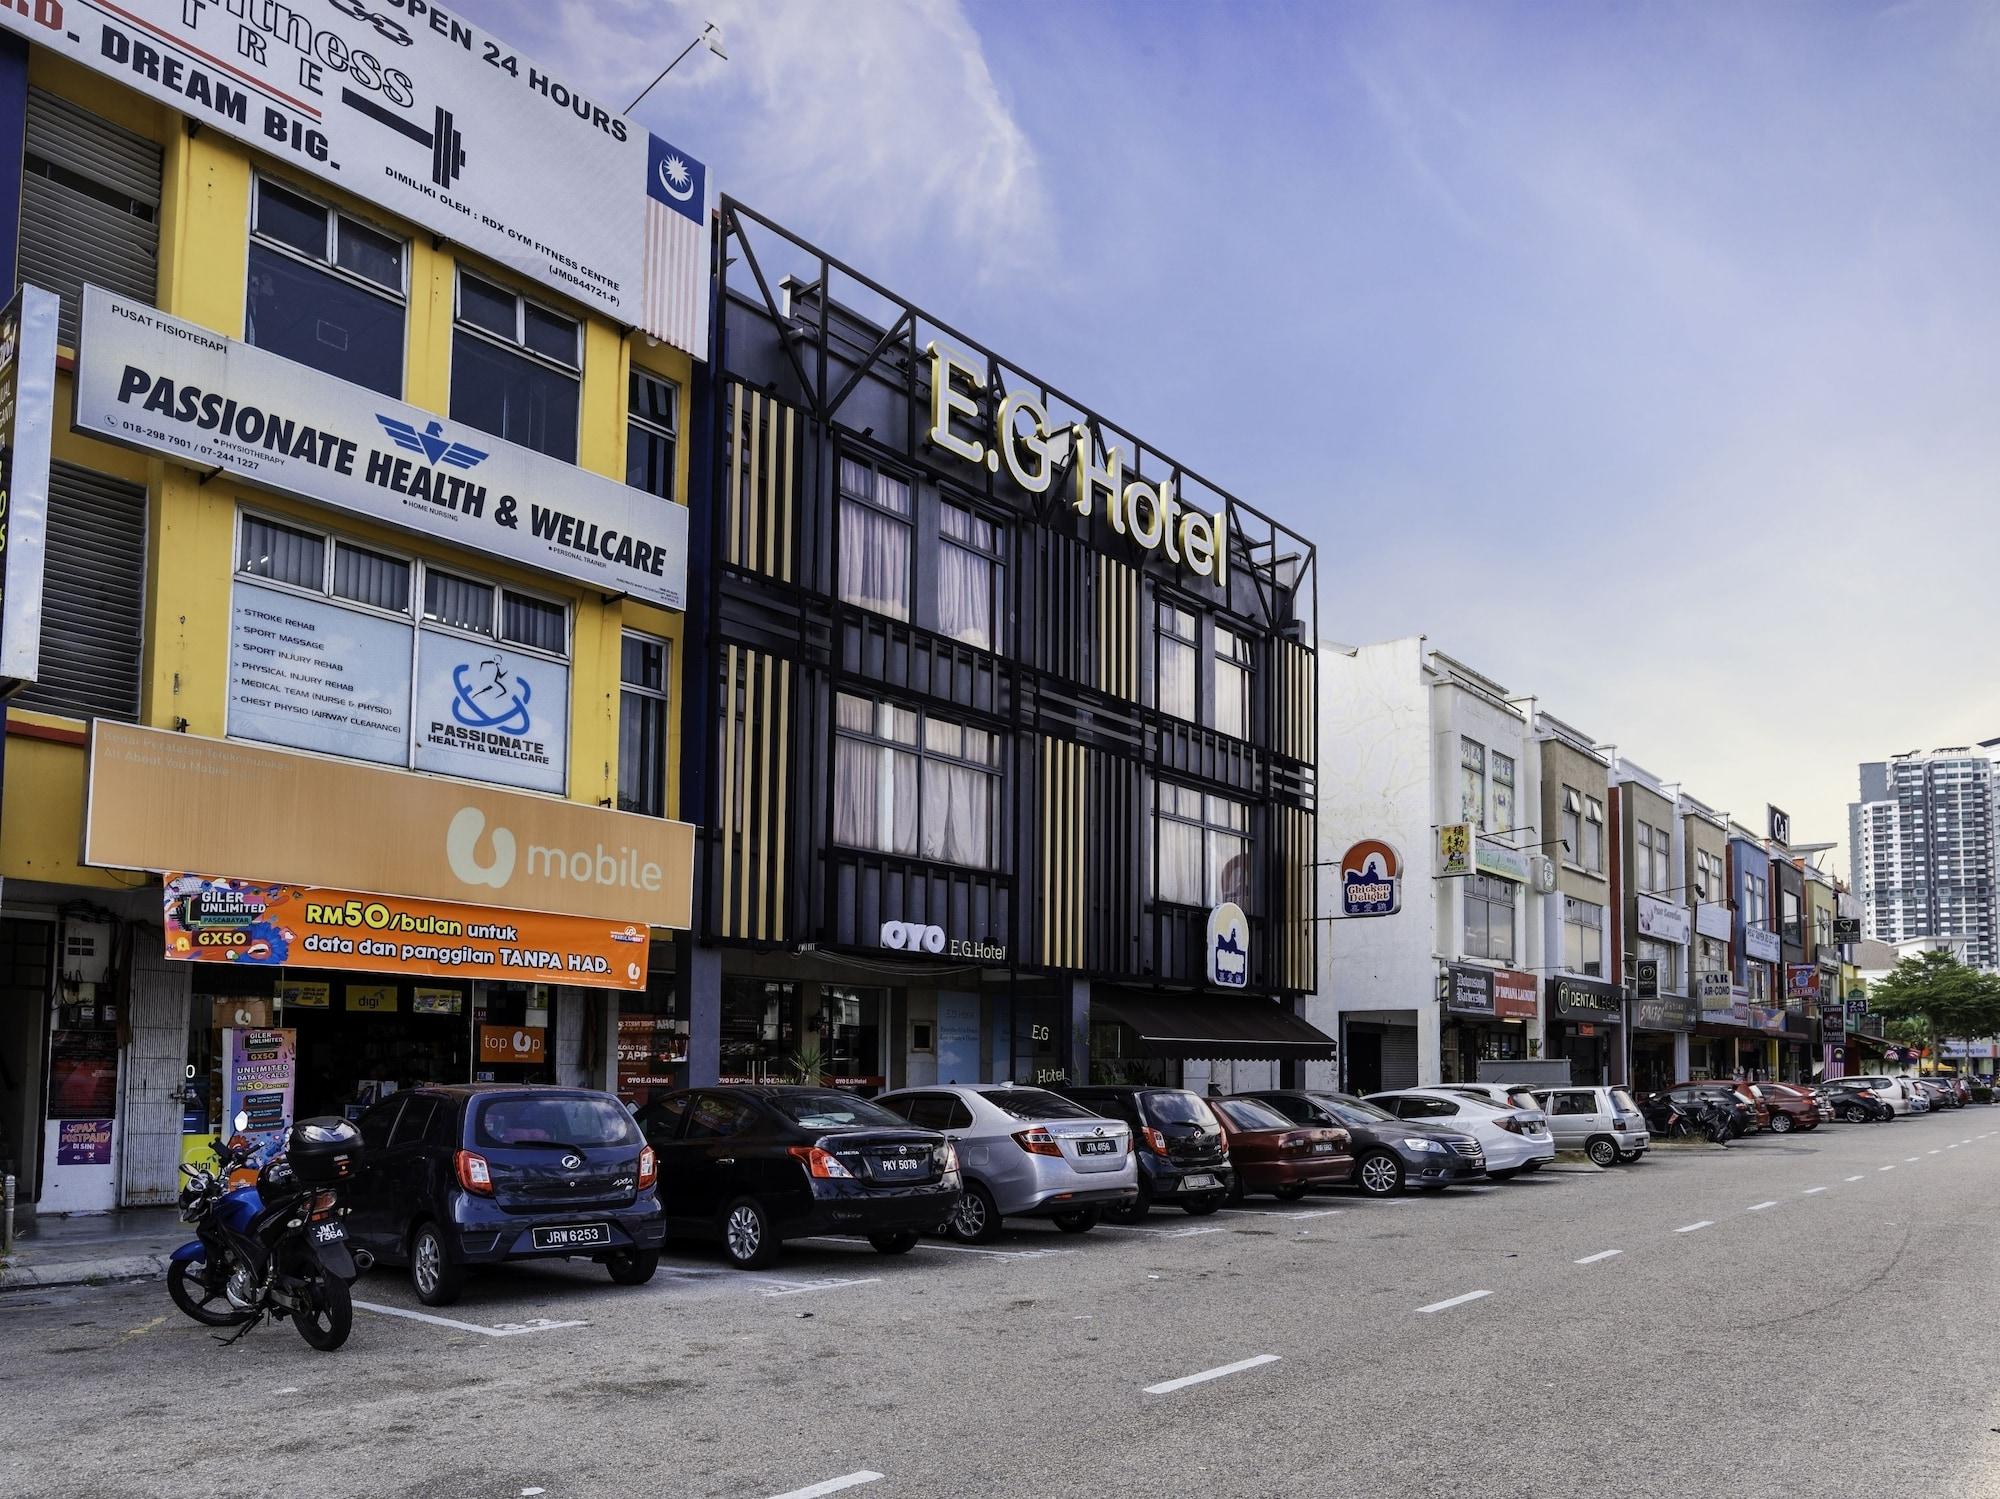 OYO 494 EG Hotel, Johor Bahru